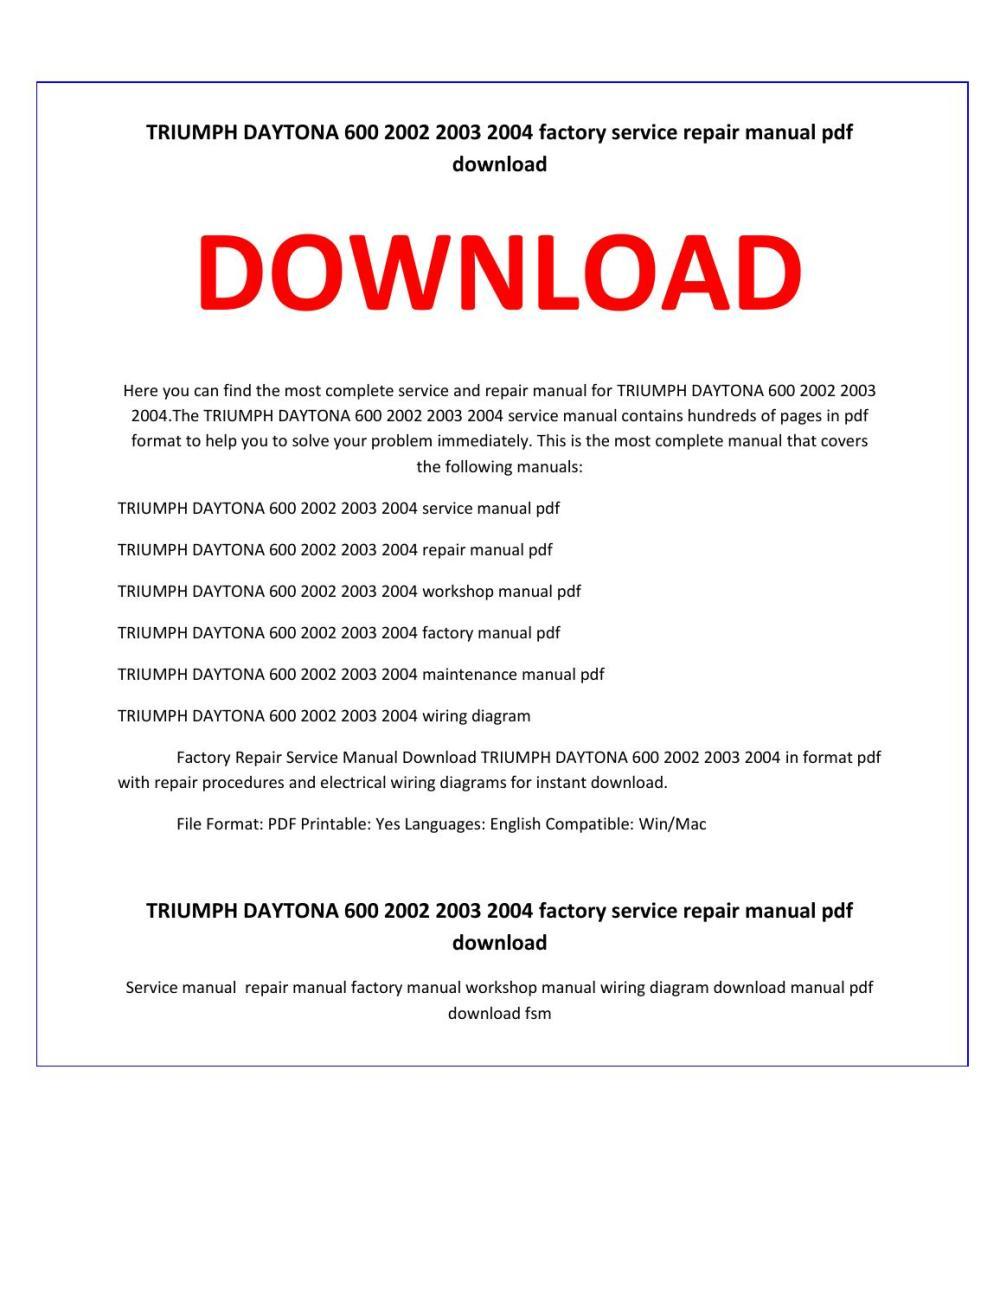 medium resolution of triumph daytona 600 2002 2003 2004 service repair manual by service manual issuu